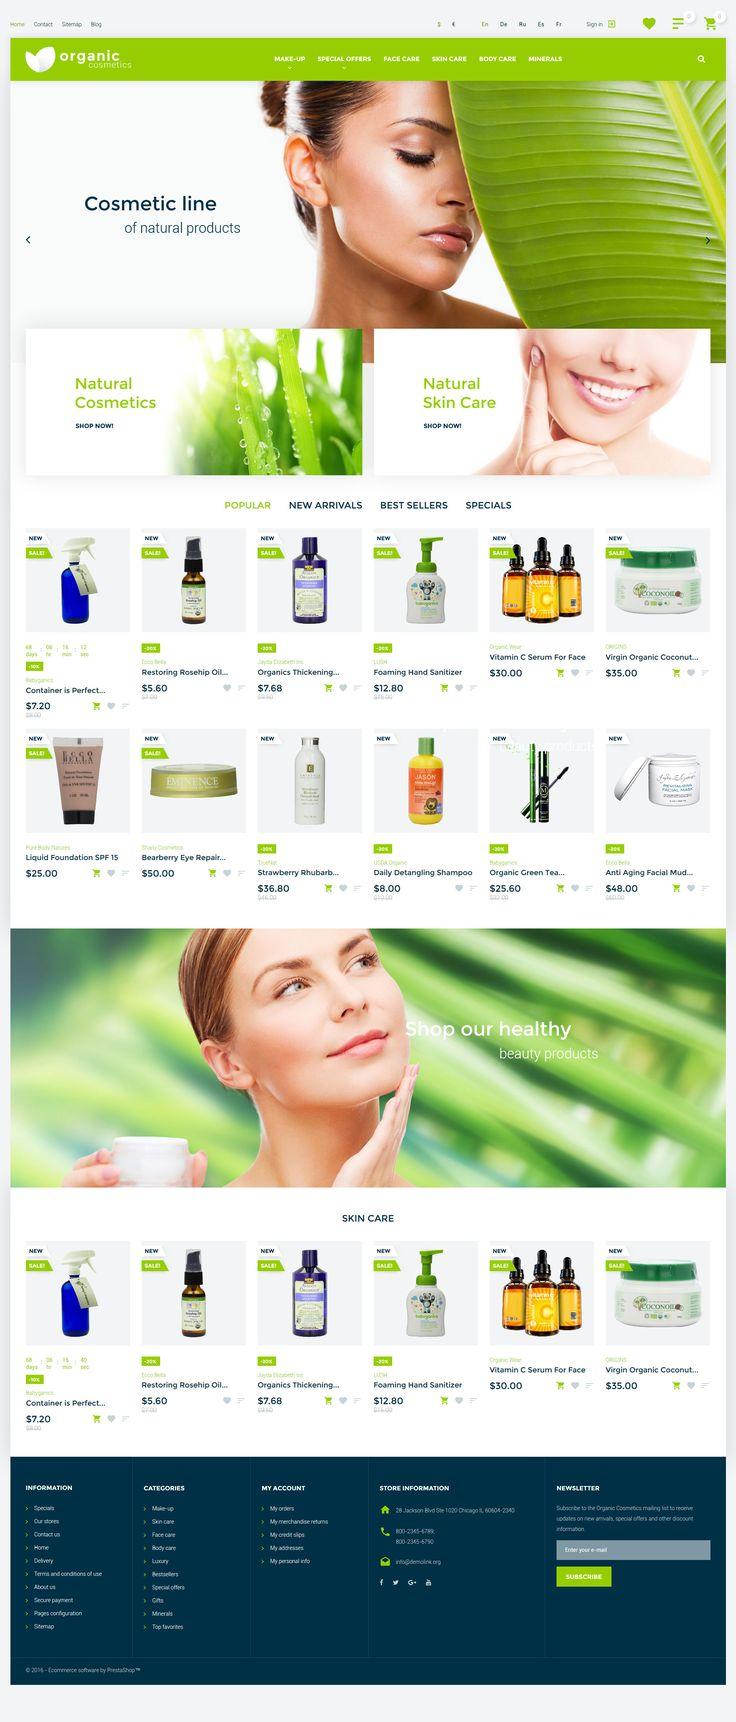 Organic Cosmetics PrestaShop theme http://www.templatemonster.com/prestashop-themes/organic-cosmetics-responsive-prestashop-theme-57540.html